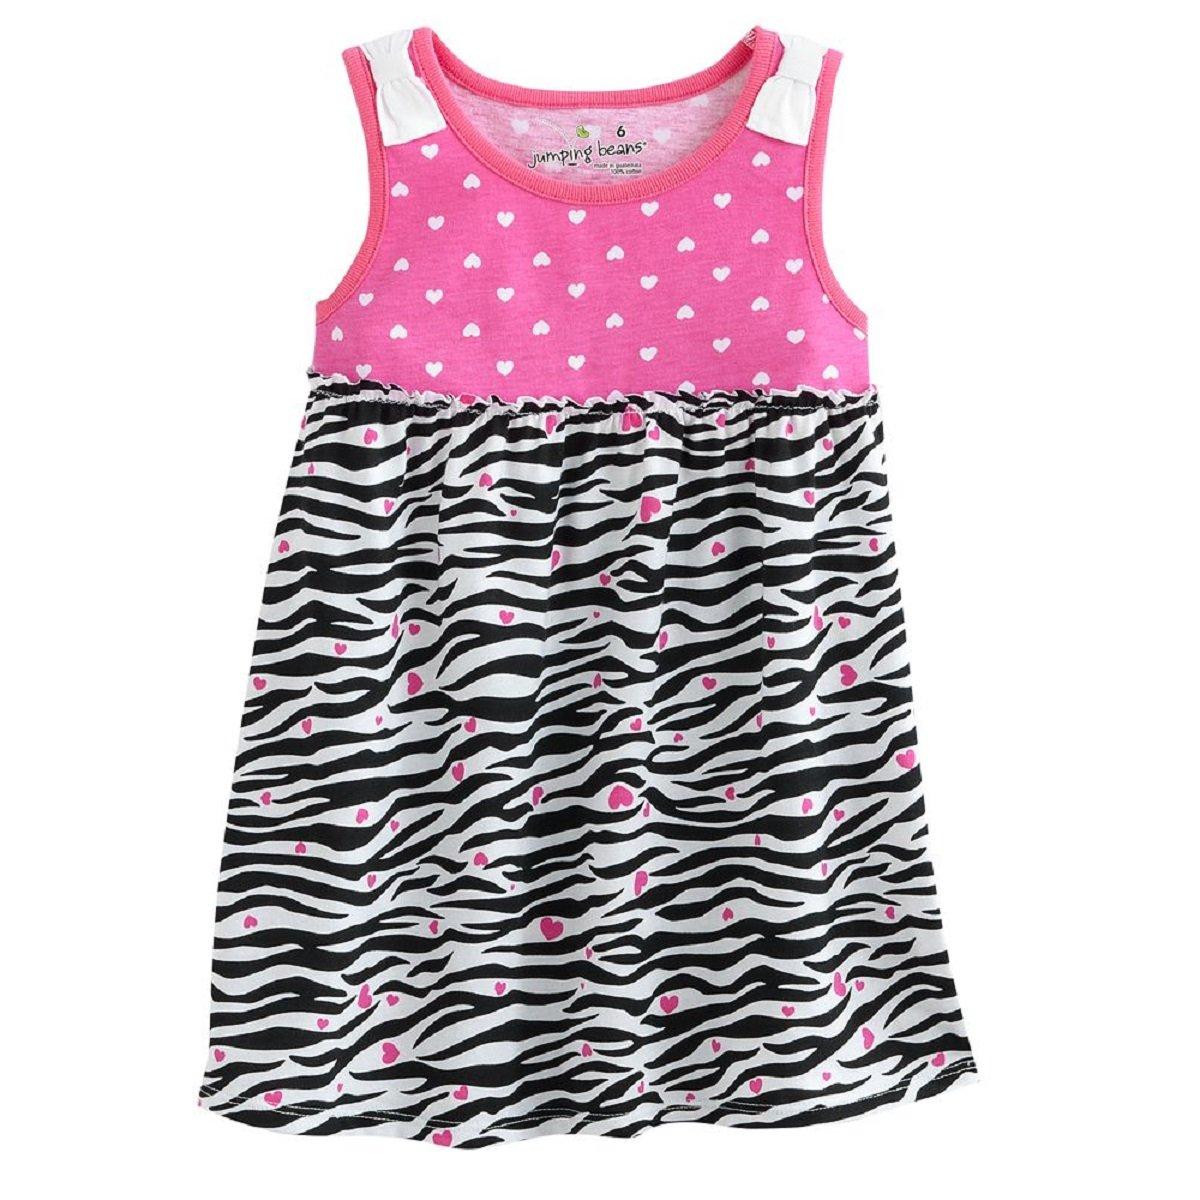 8dfc6584 Amazon.com: Jumping Beans Toddler Little Girls' Babydoll Dress (2T, White  Zebra): Clothing